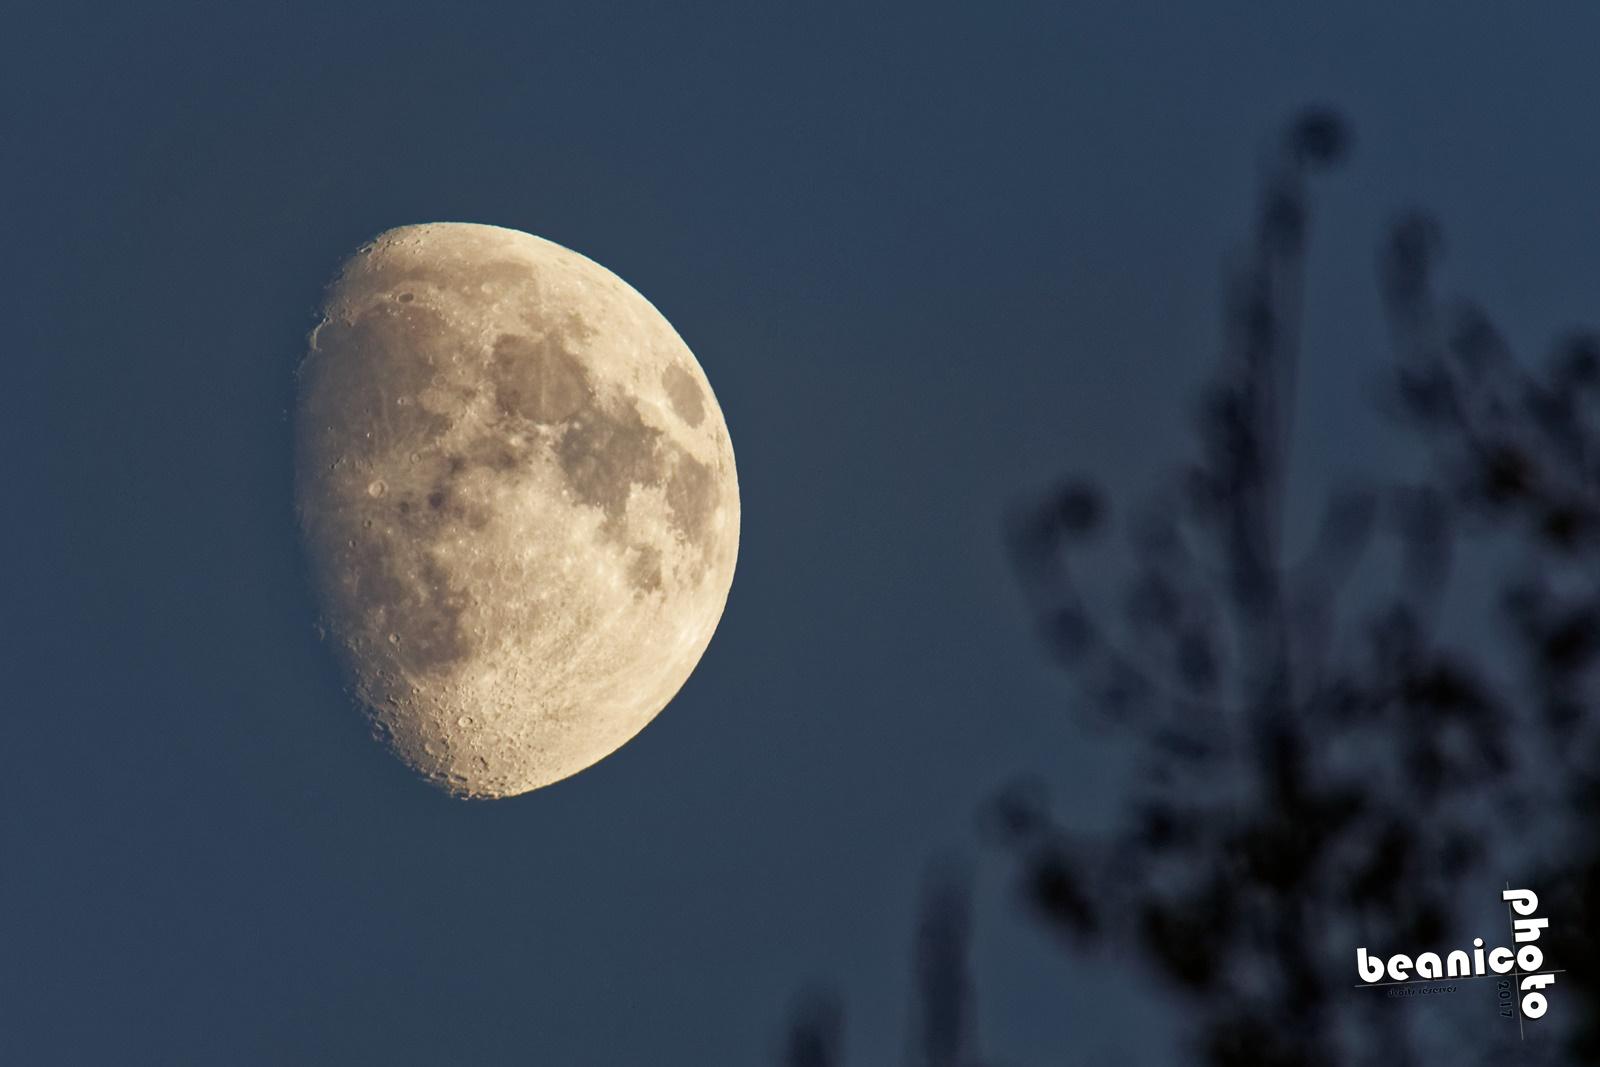 Canon 5DIII + Tamron 150-600 G2 + Kenko 1,5x - 900mm f/6.3 1/500 ISO1600 - La Lune - beanico-photo